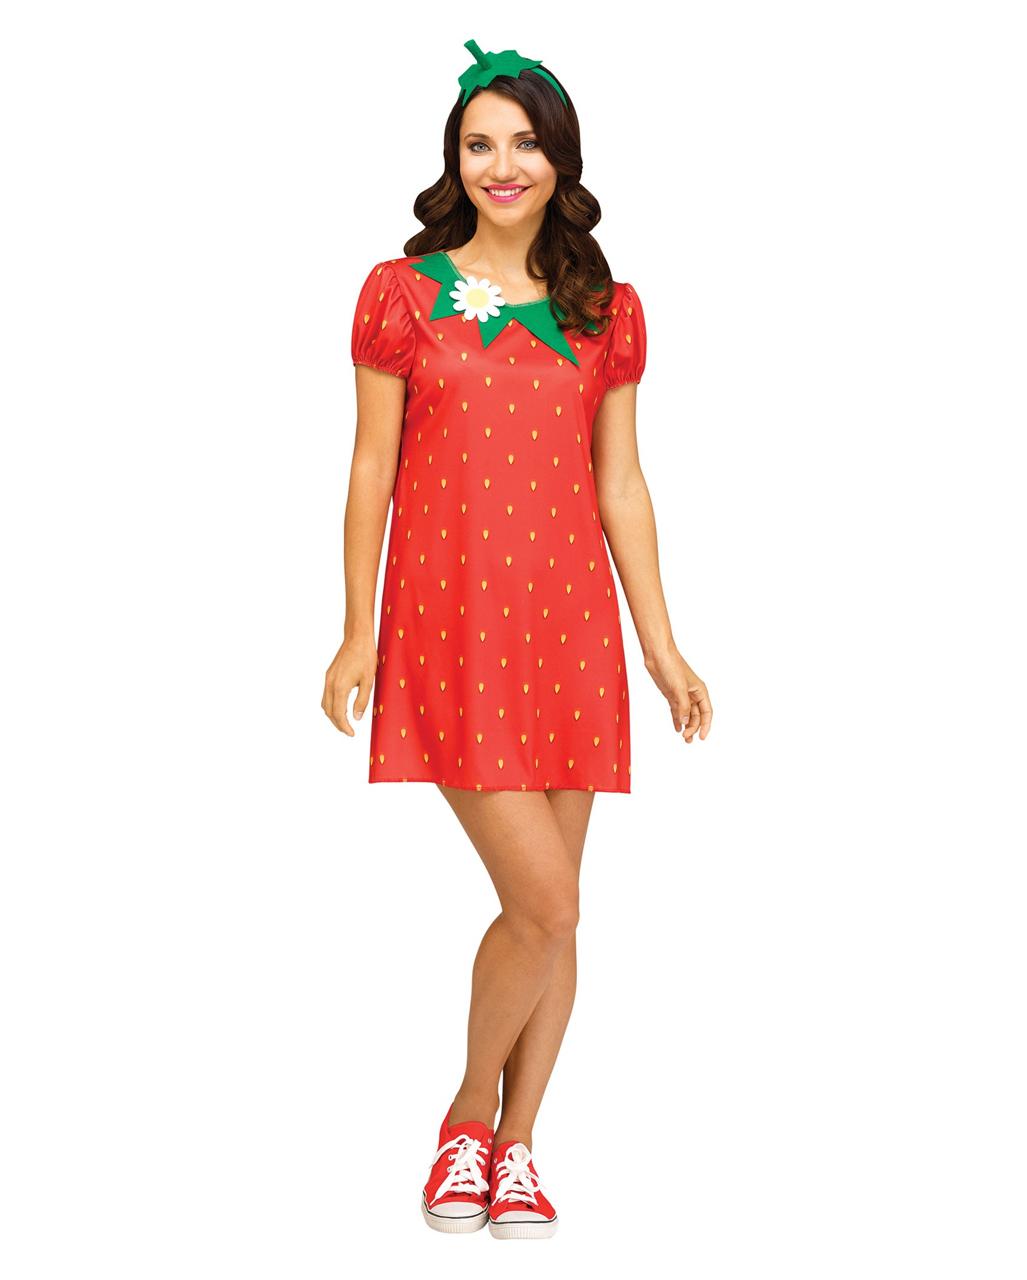 Sexy Erdbeere Kostum Susse Obst Verkleidung Horror Shop Com